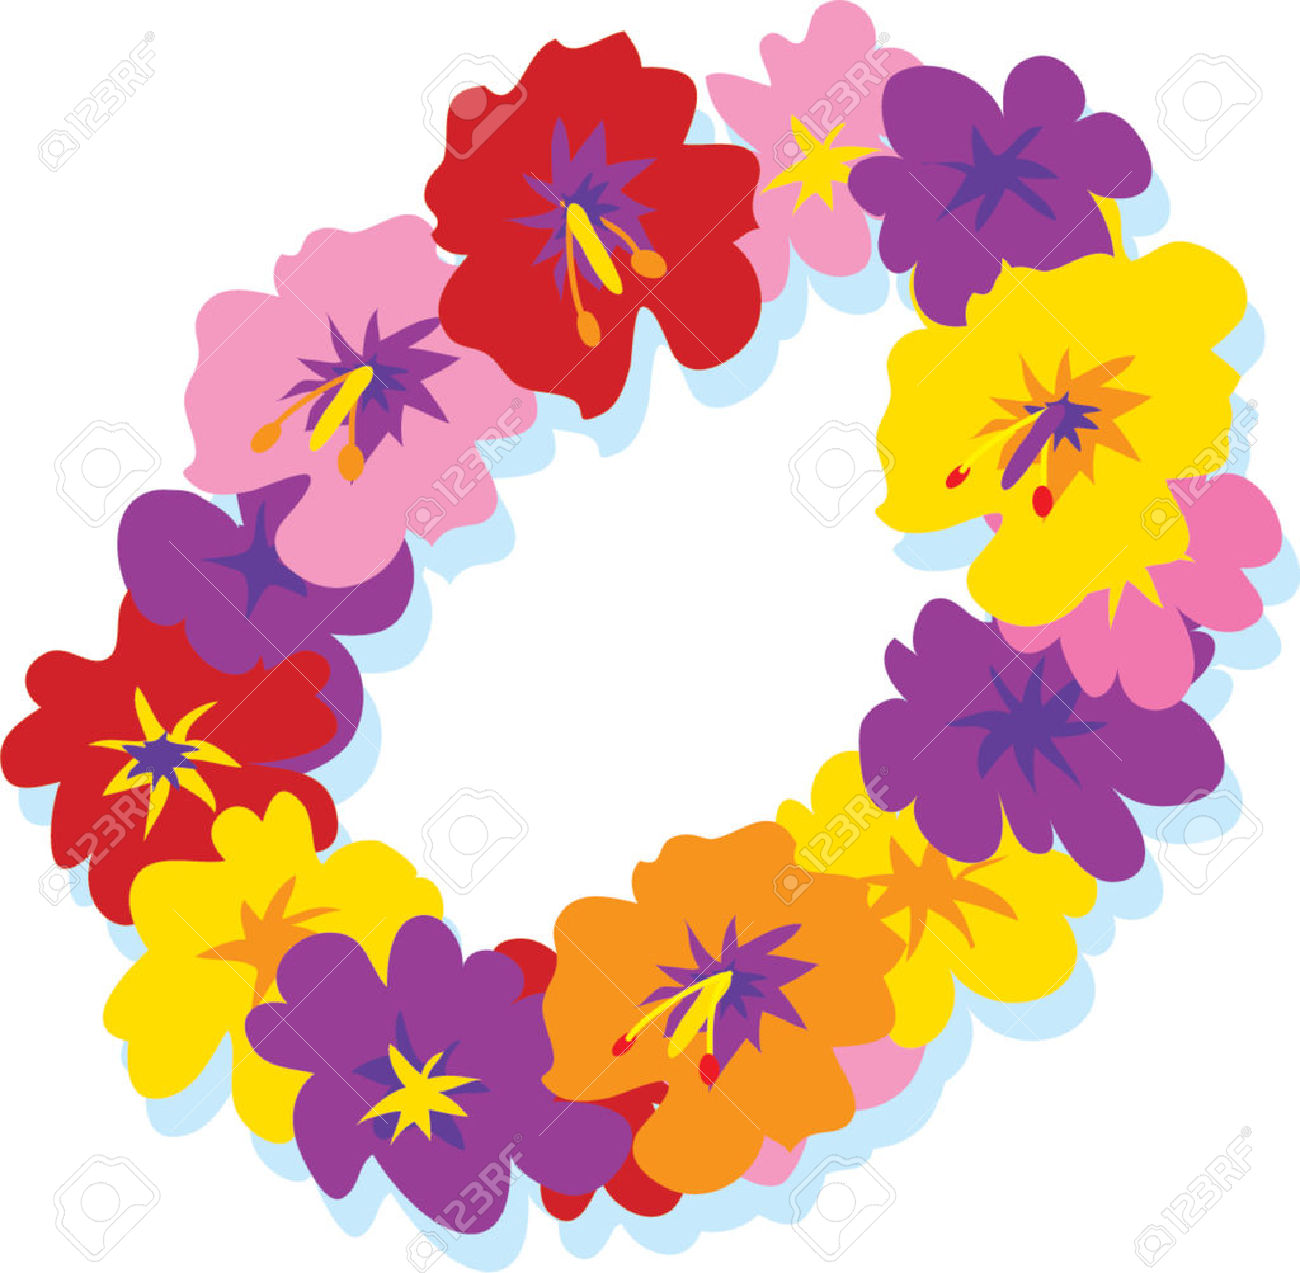 Hawaiian Flower Cartoon Images Flowers Healthy